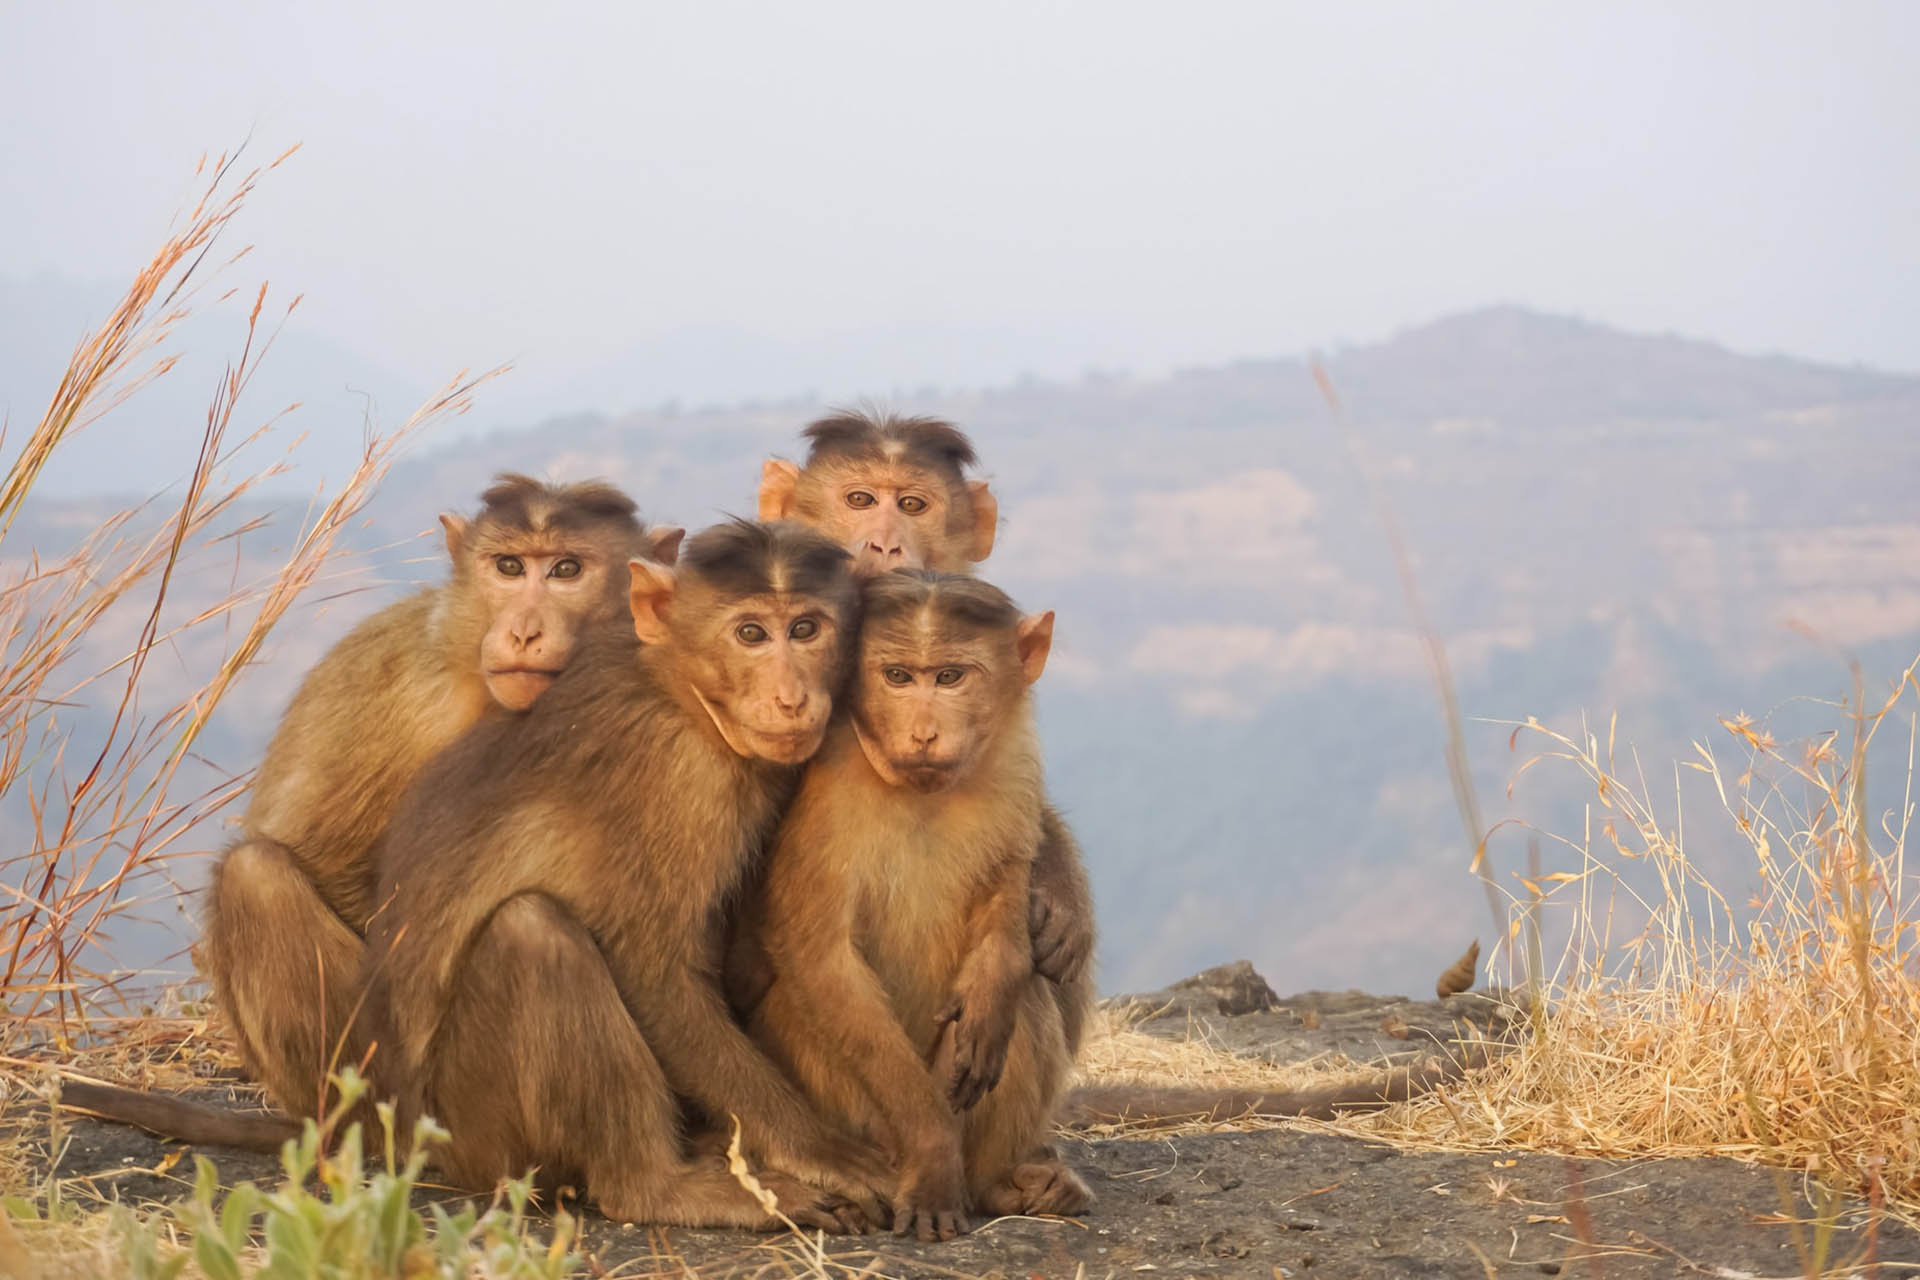 Matheran Featured image Monkeys